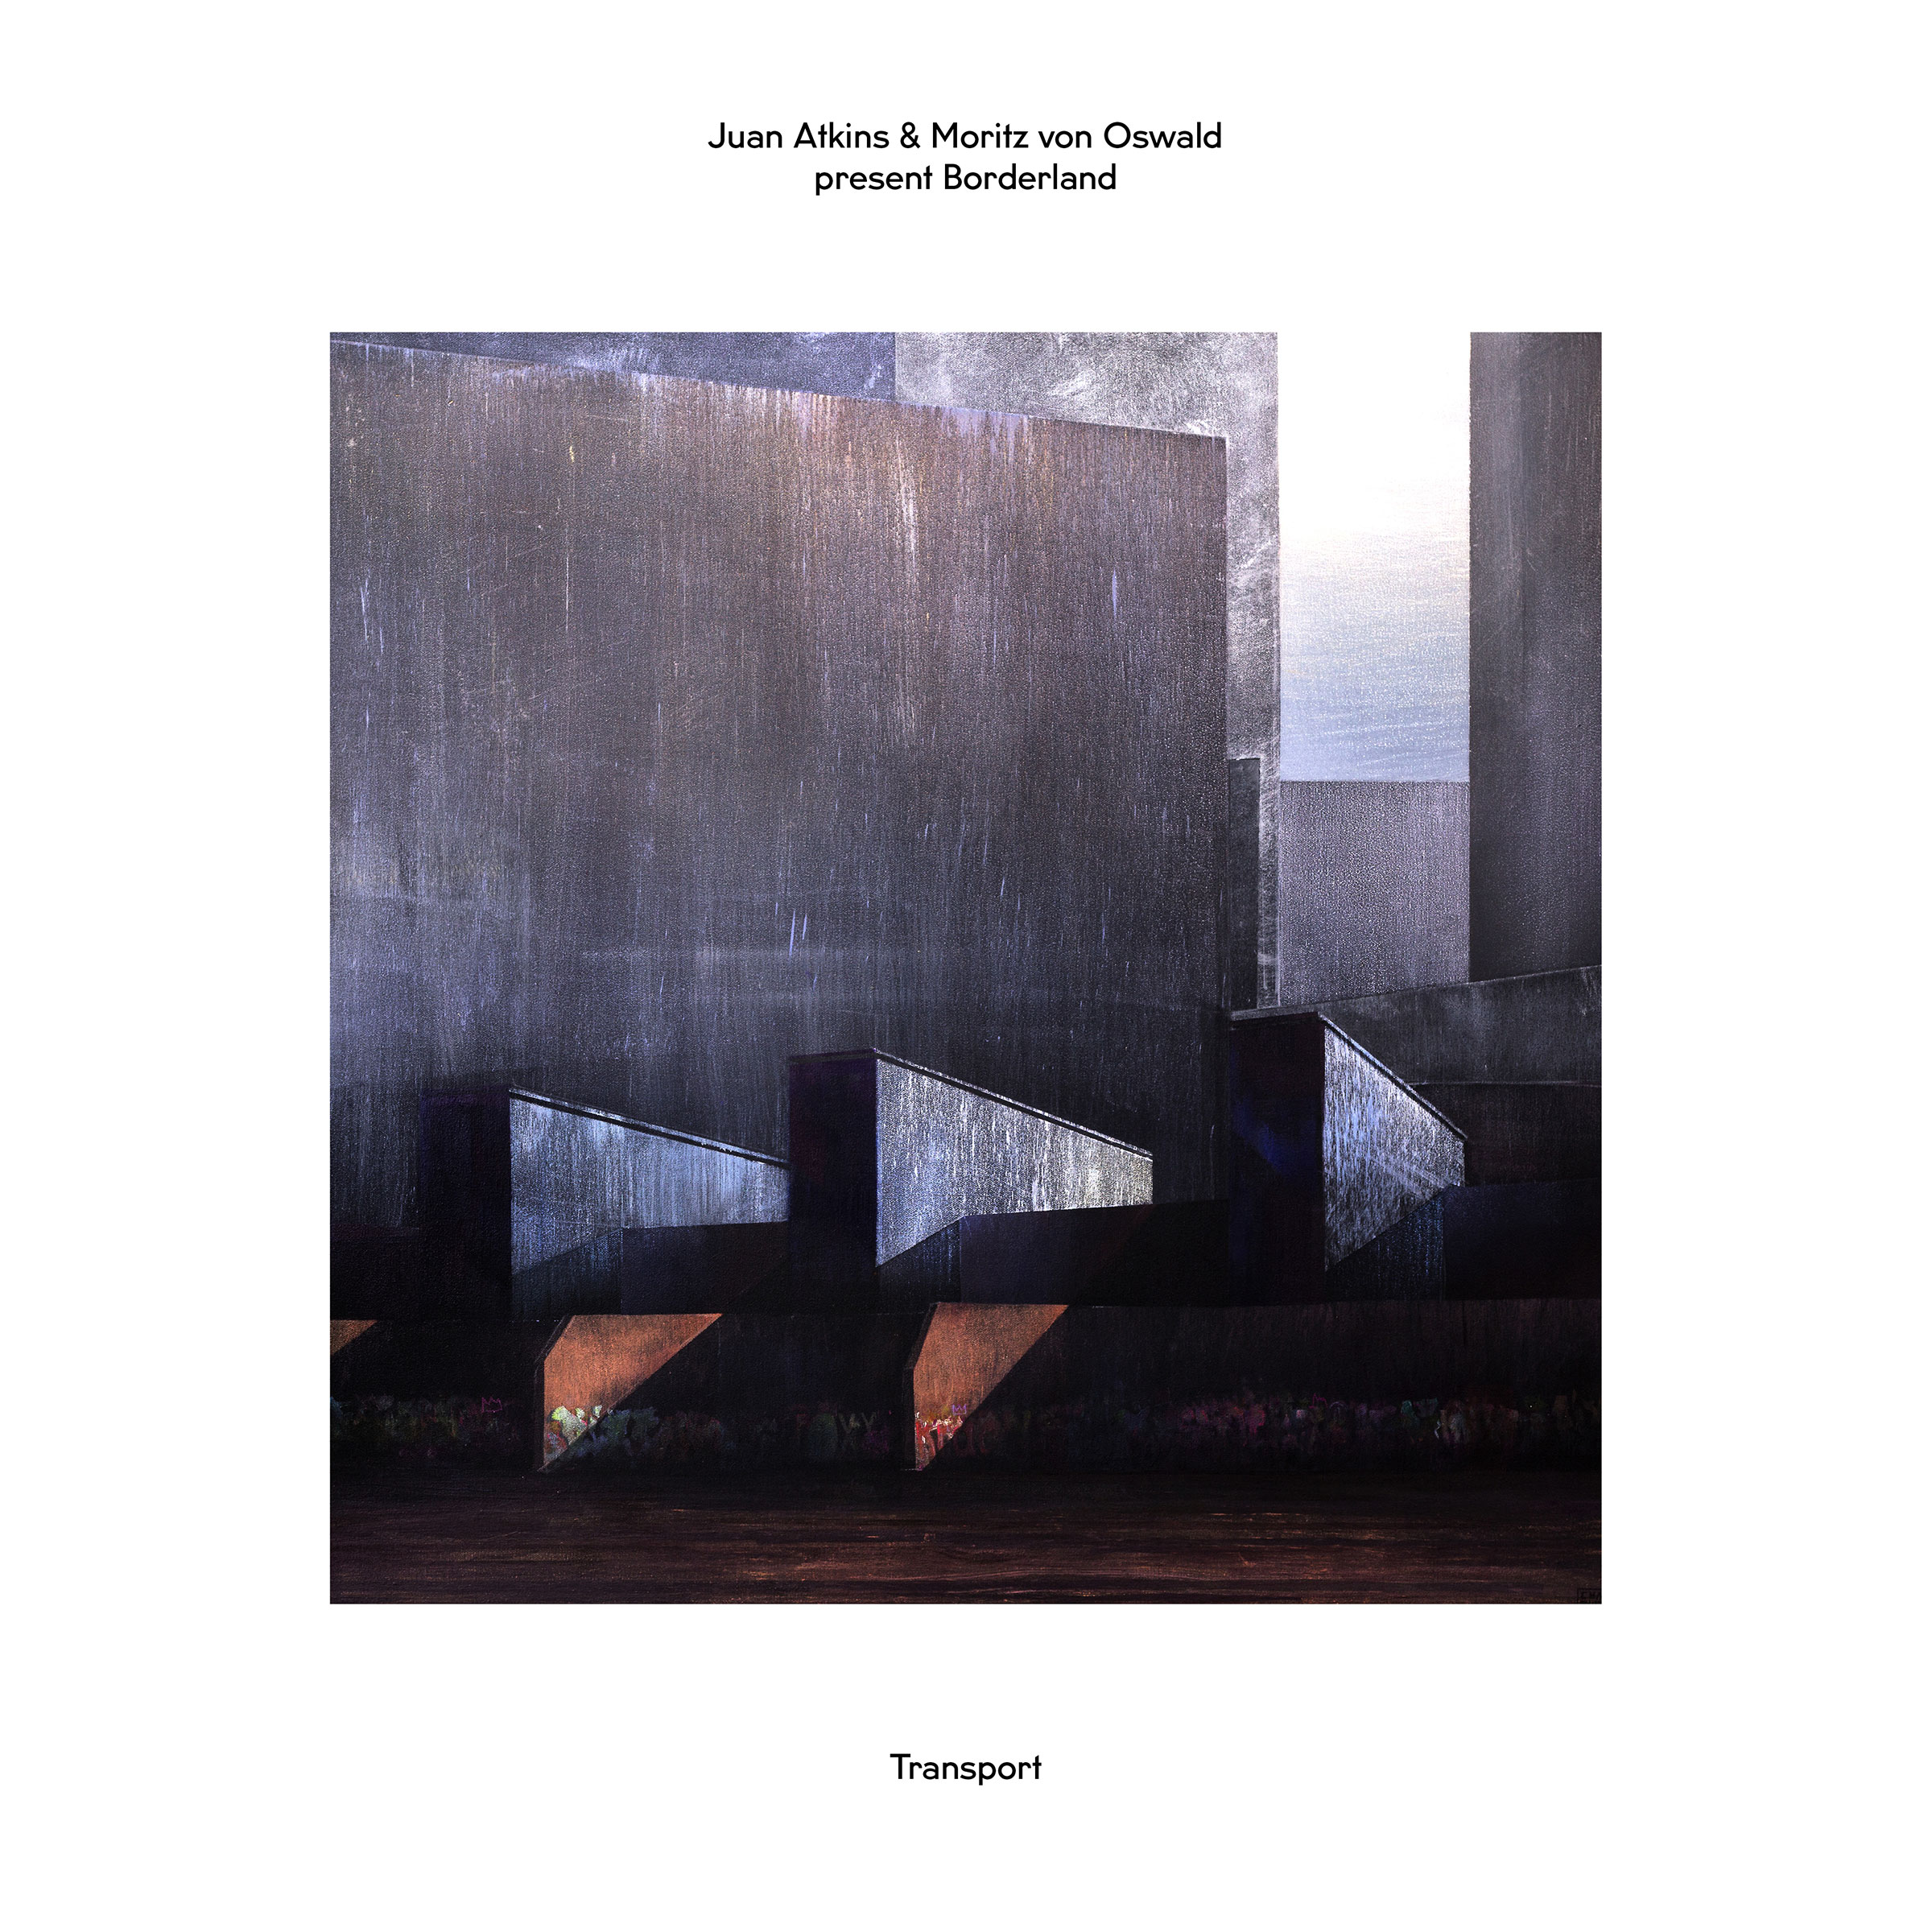 Juan Atkins & Moritz Von Oswald present Borderland – Transport